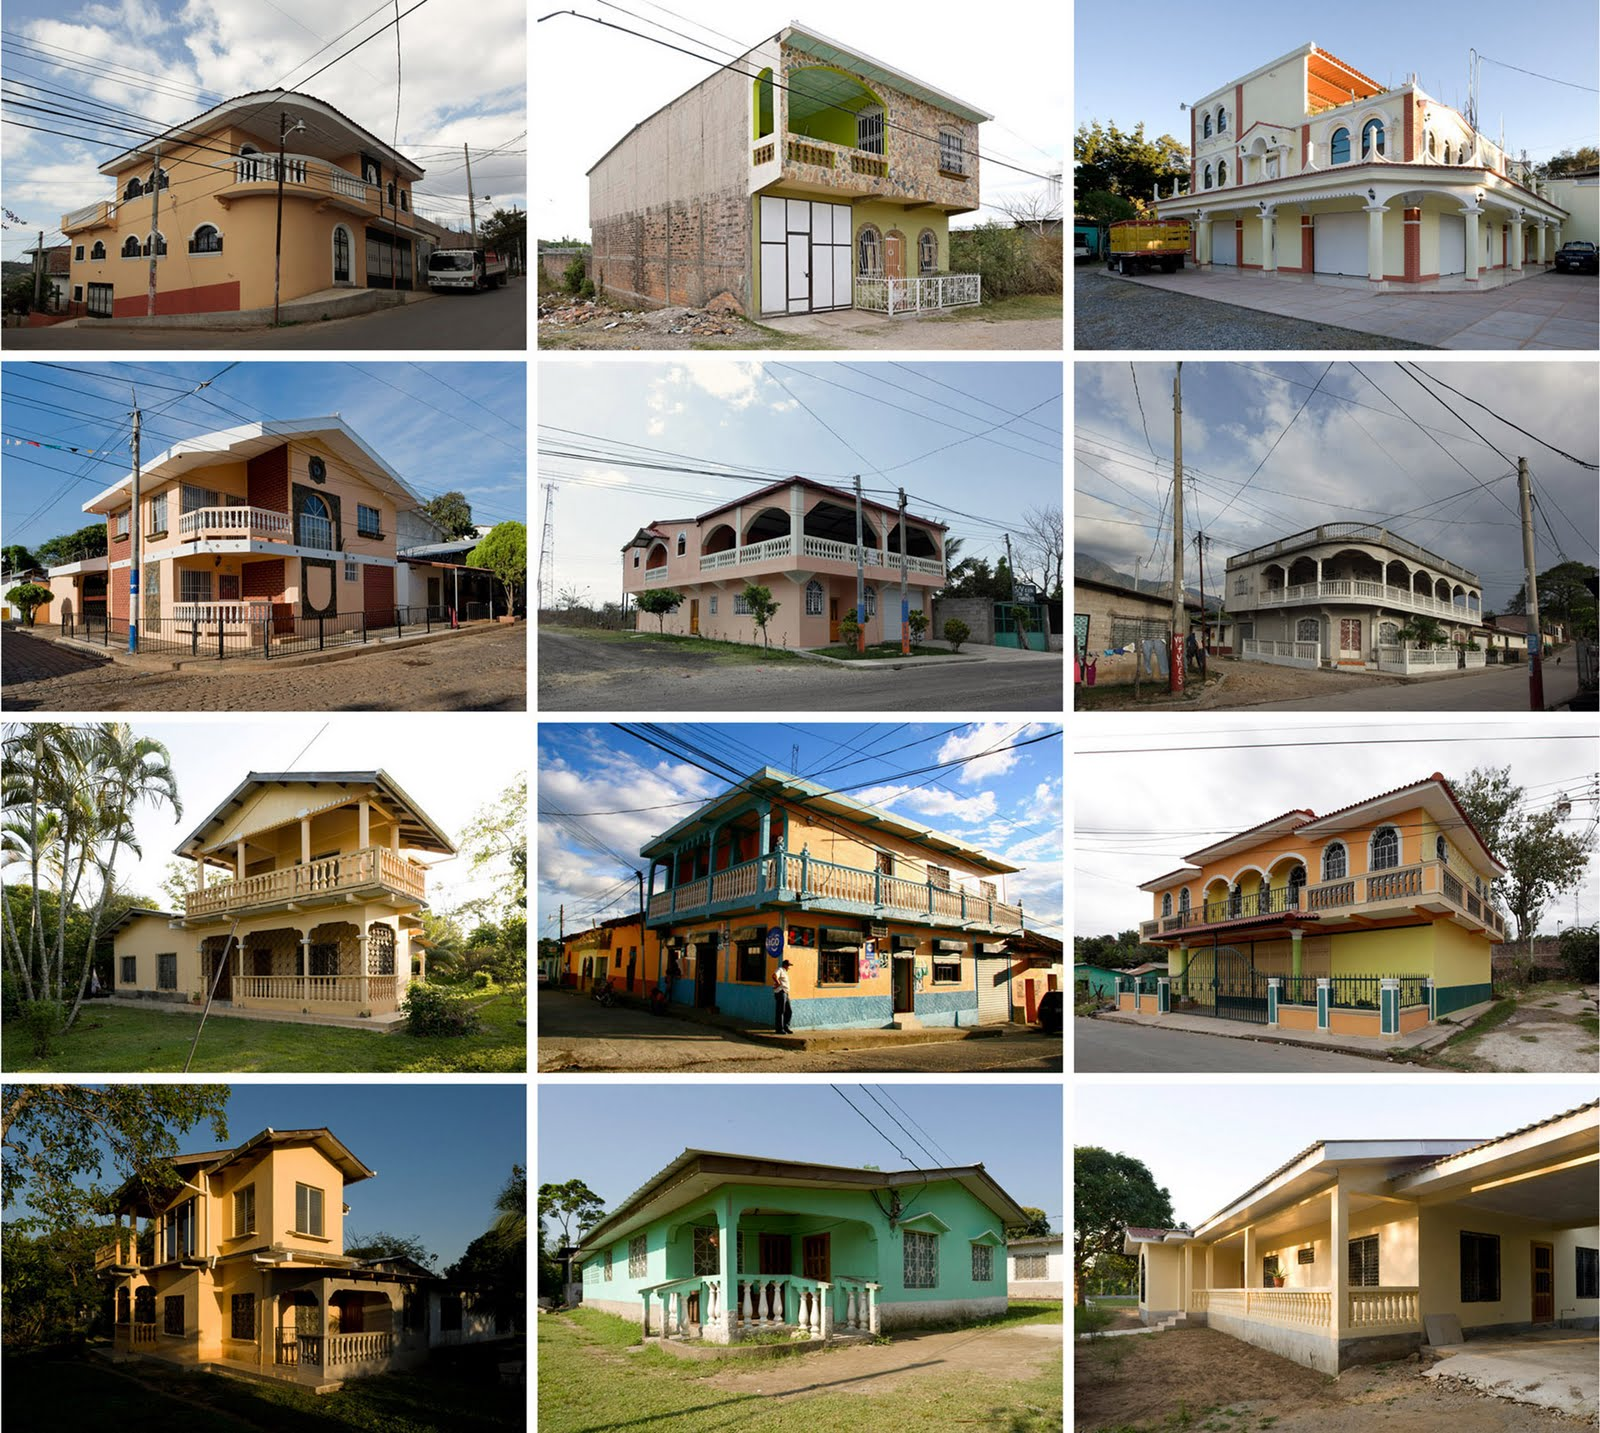 Arquitectura de remesas for Arquitectura definicion